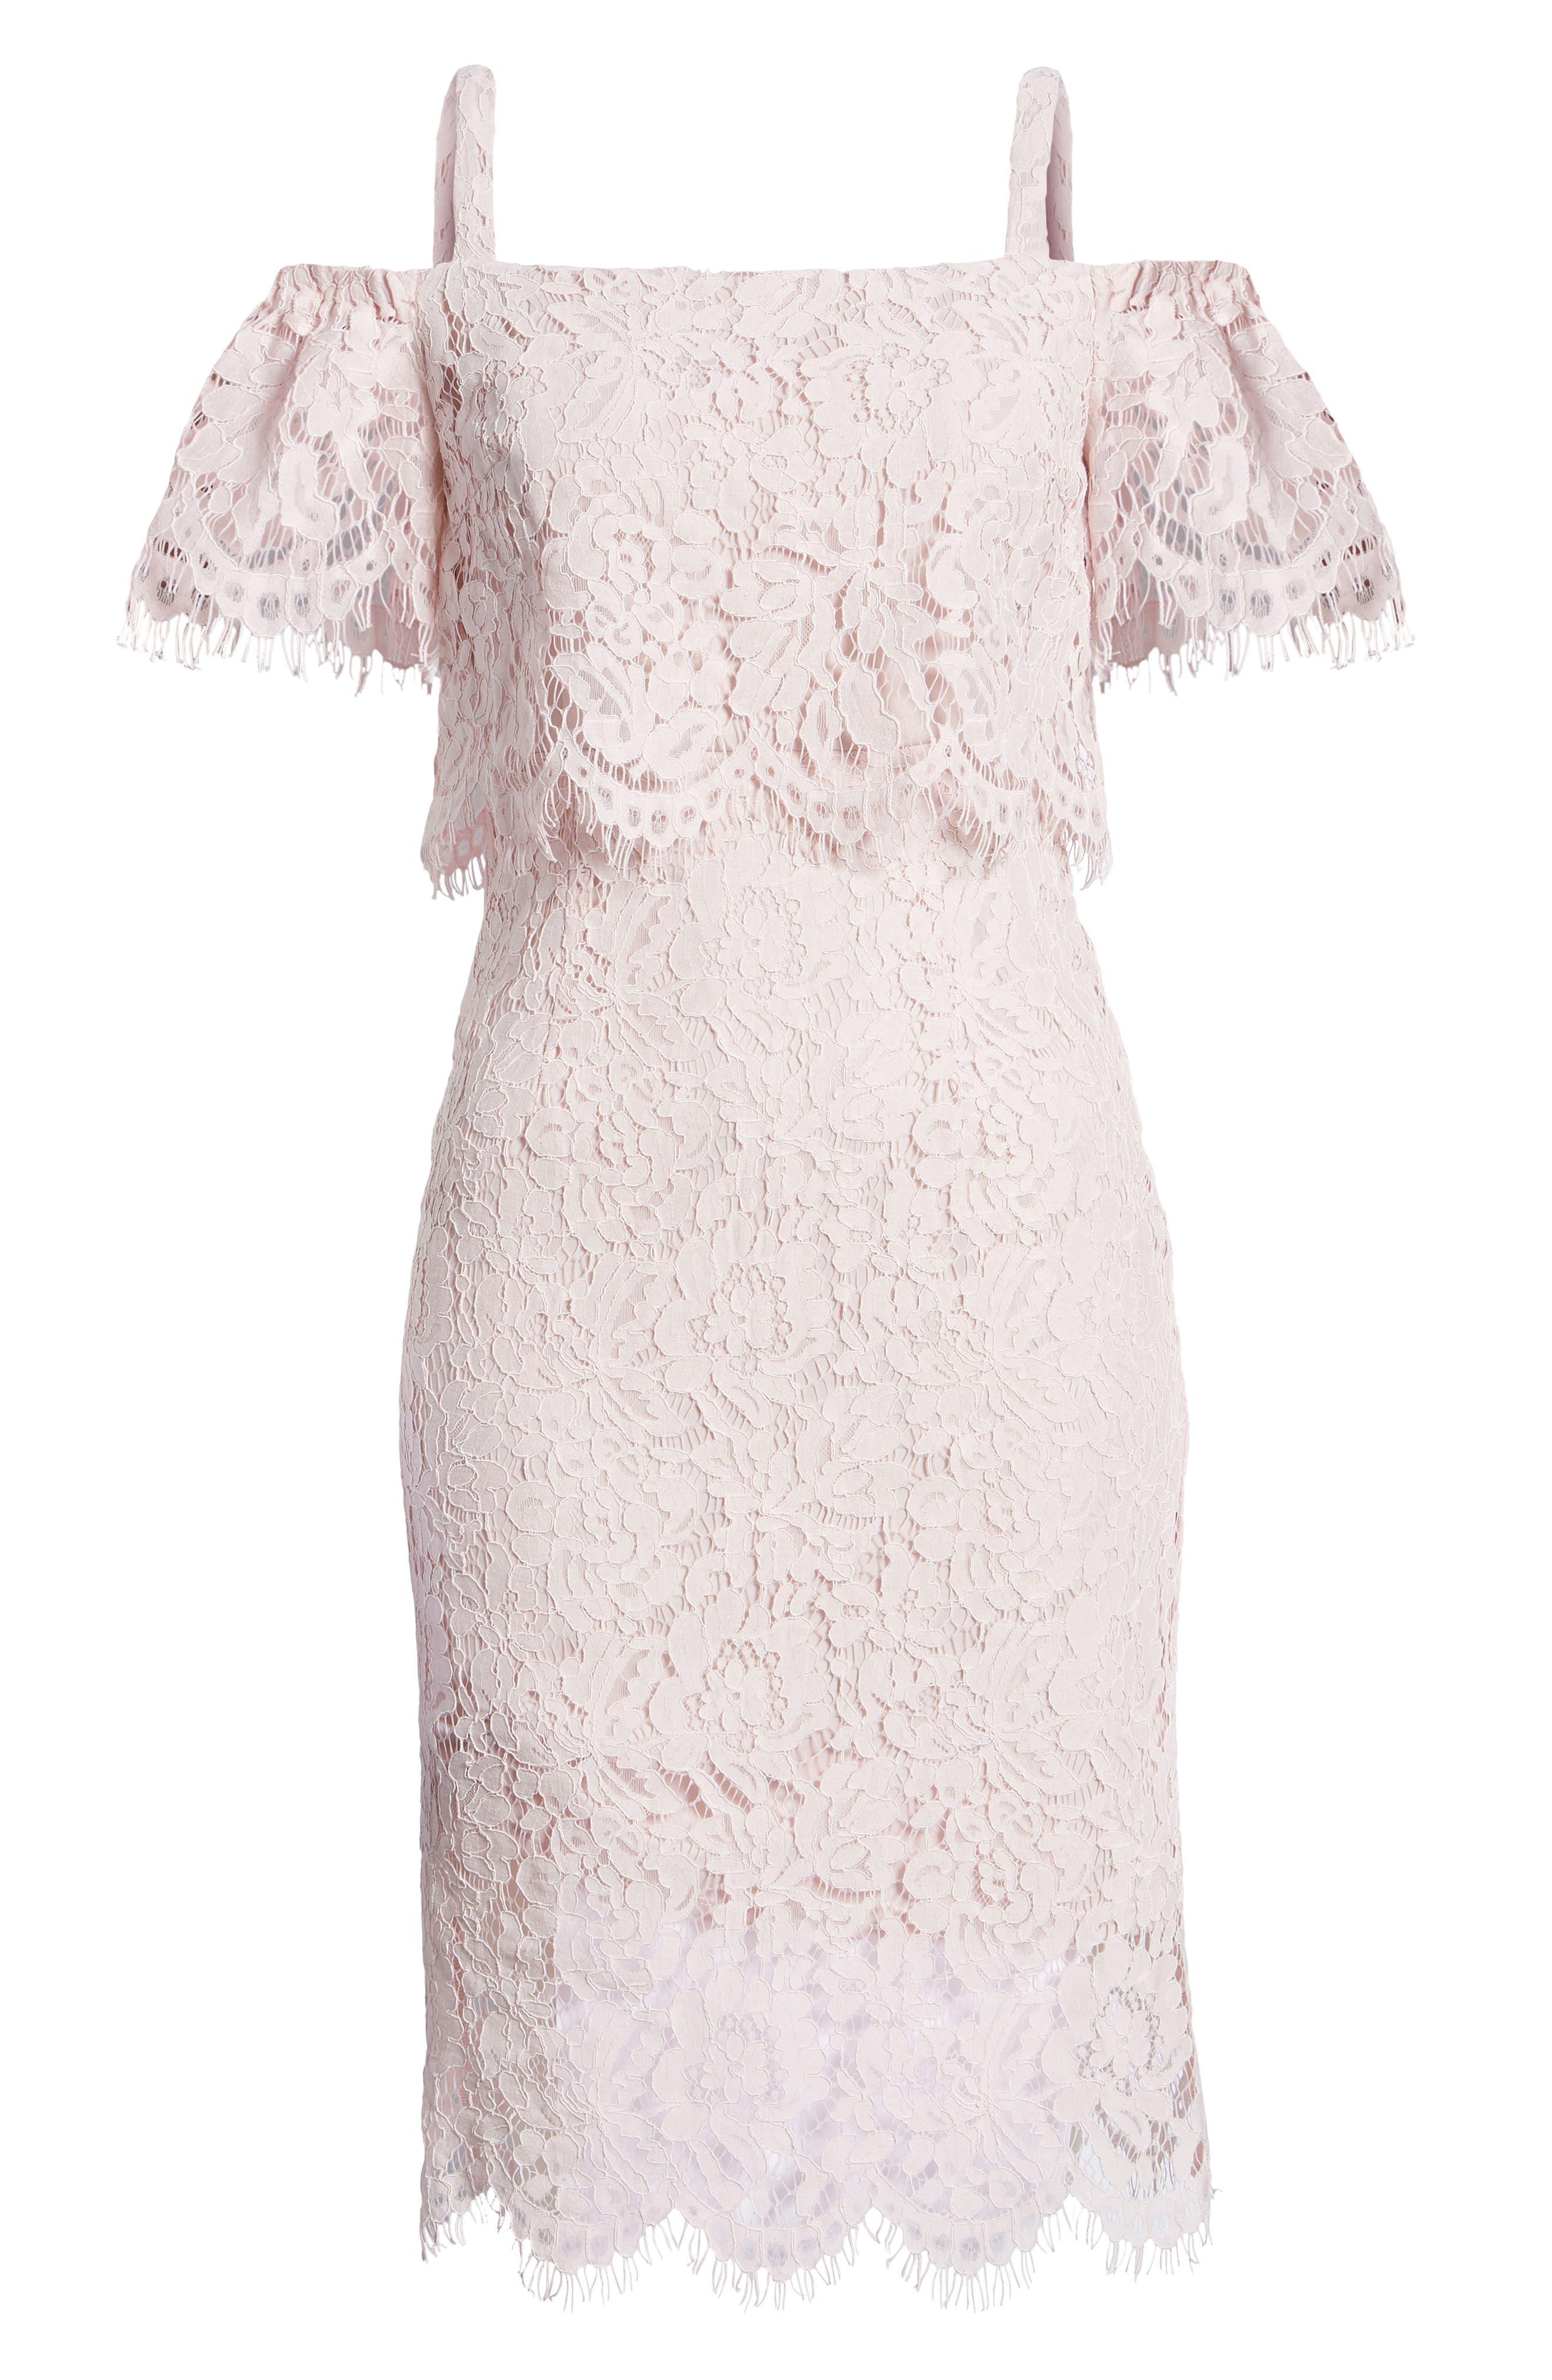 Popover Lace Dress,                             Alternate thumbnail 8, color,                             681